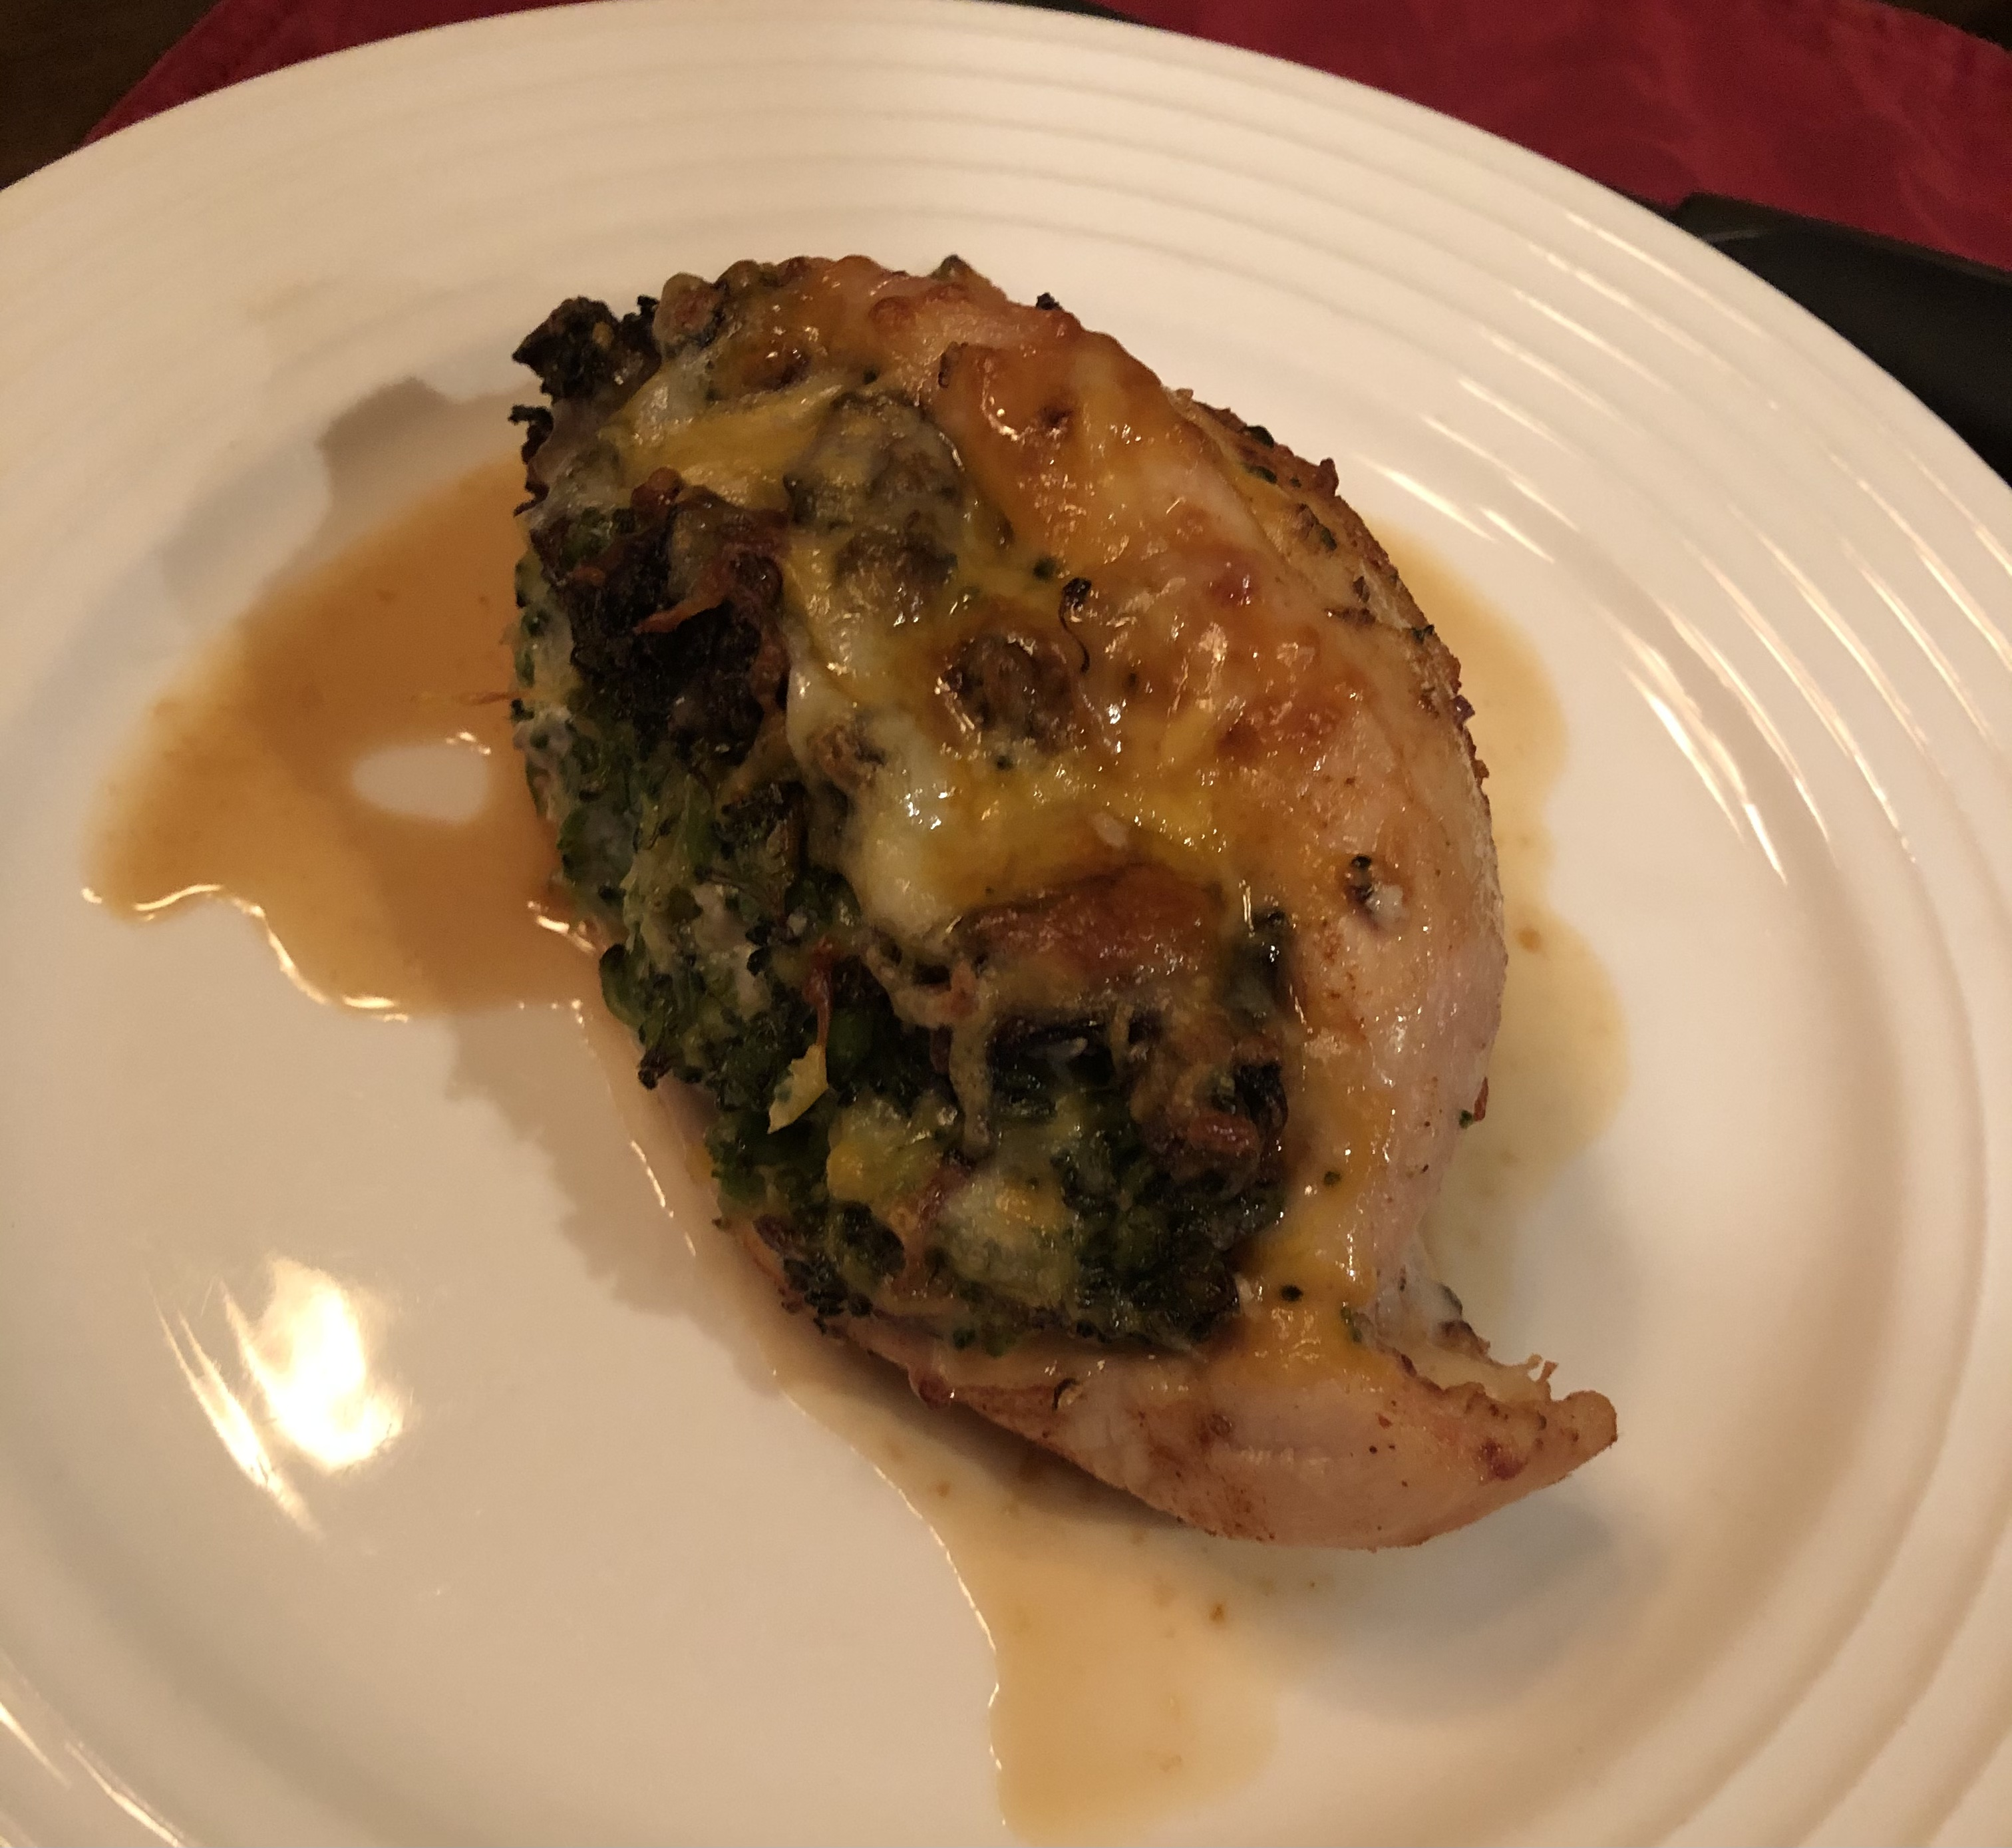 Mushroom, Broccoli, and Cheese Stuffed Chicken